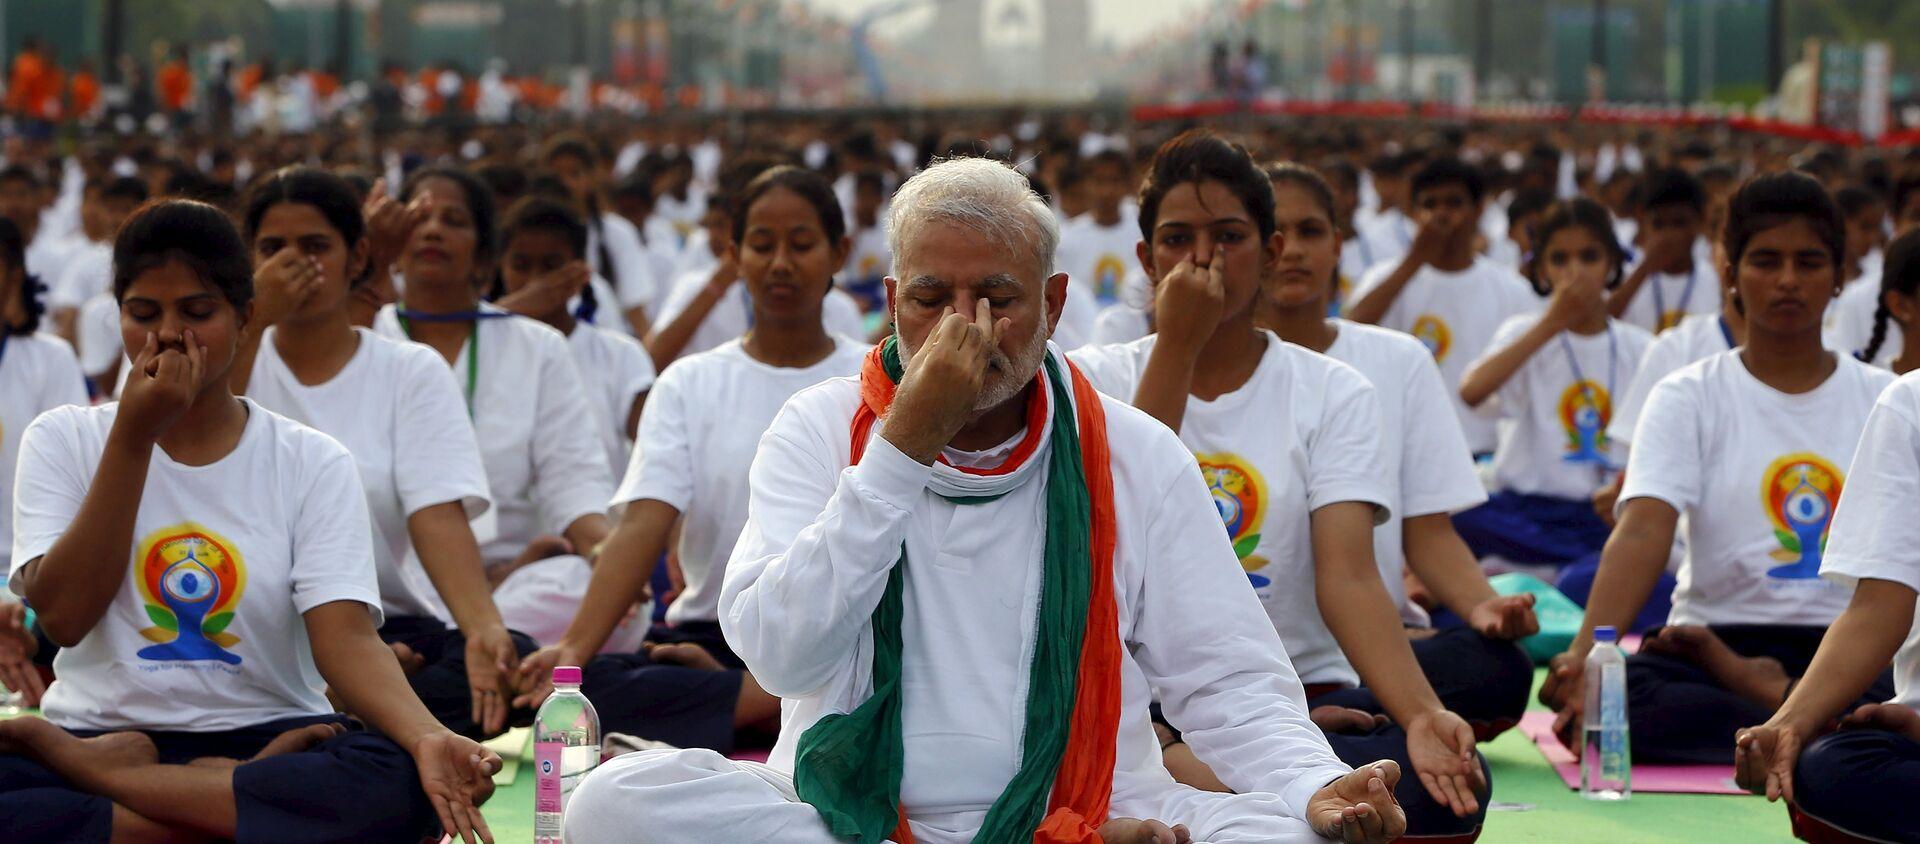 Narendra Modi, primer ministro de la India da clase de yoga para 35.000 personas en Nueva Delhi - Sputnik Mundo, 1920, 21.06.2015